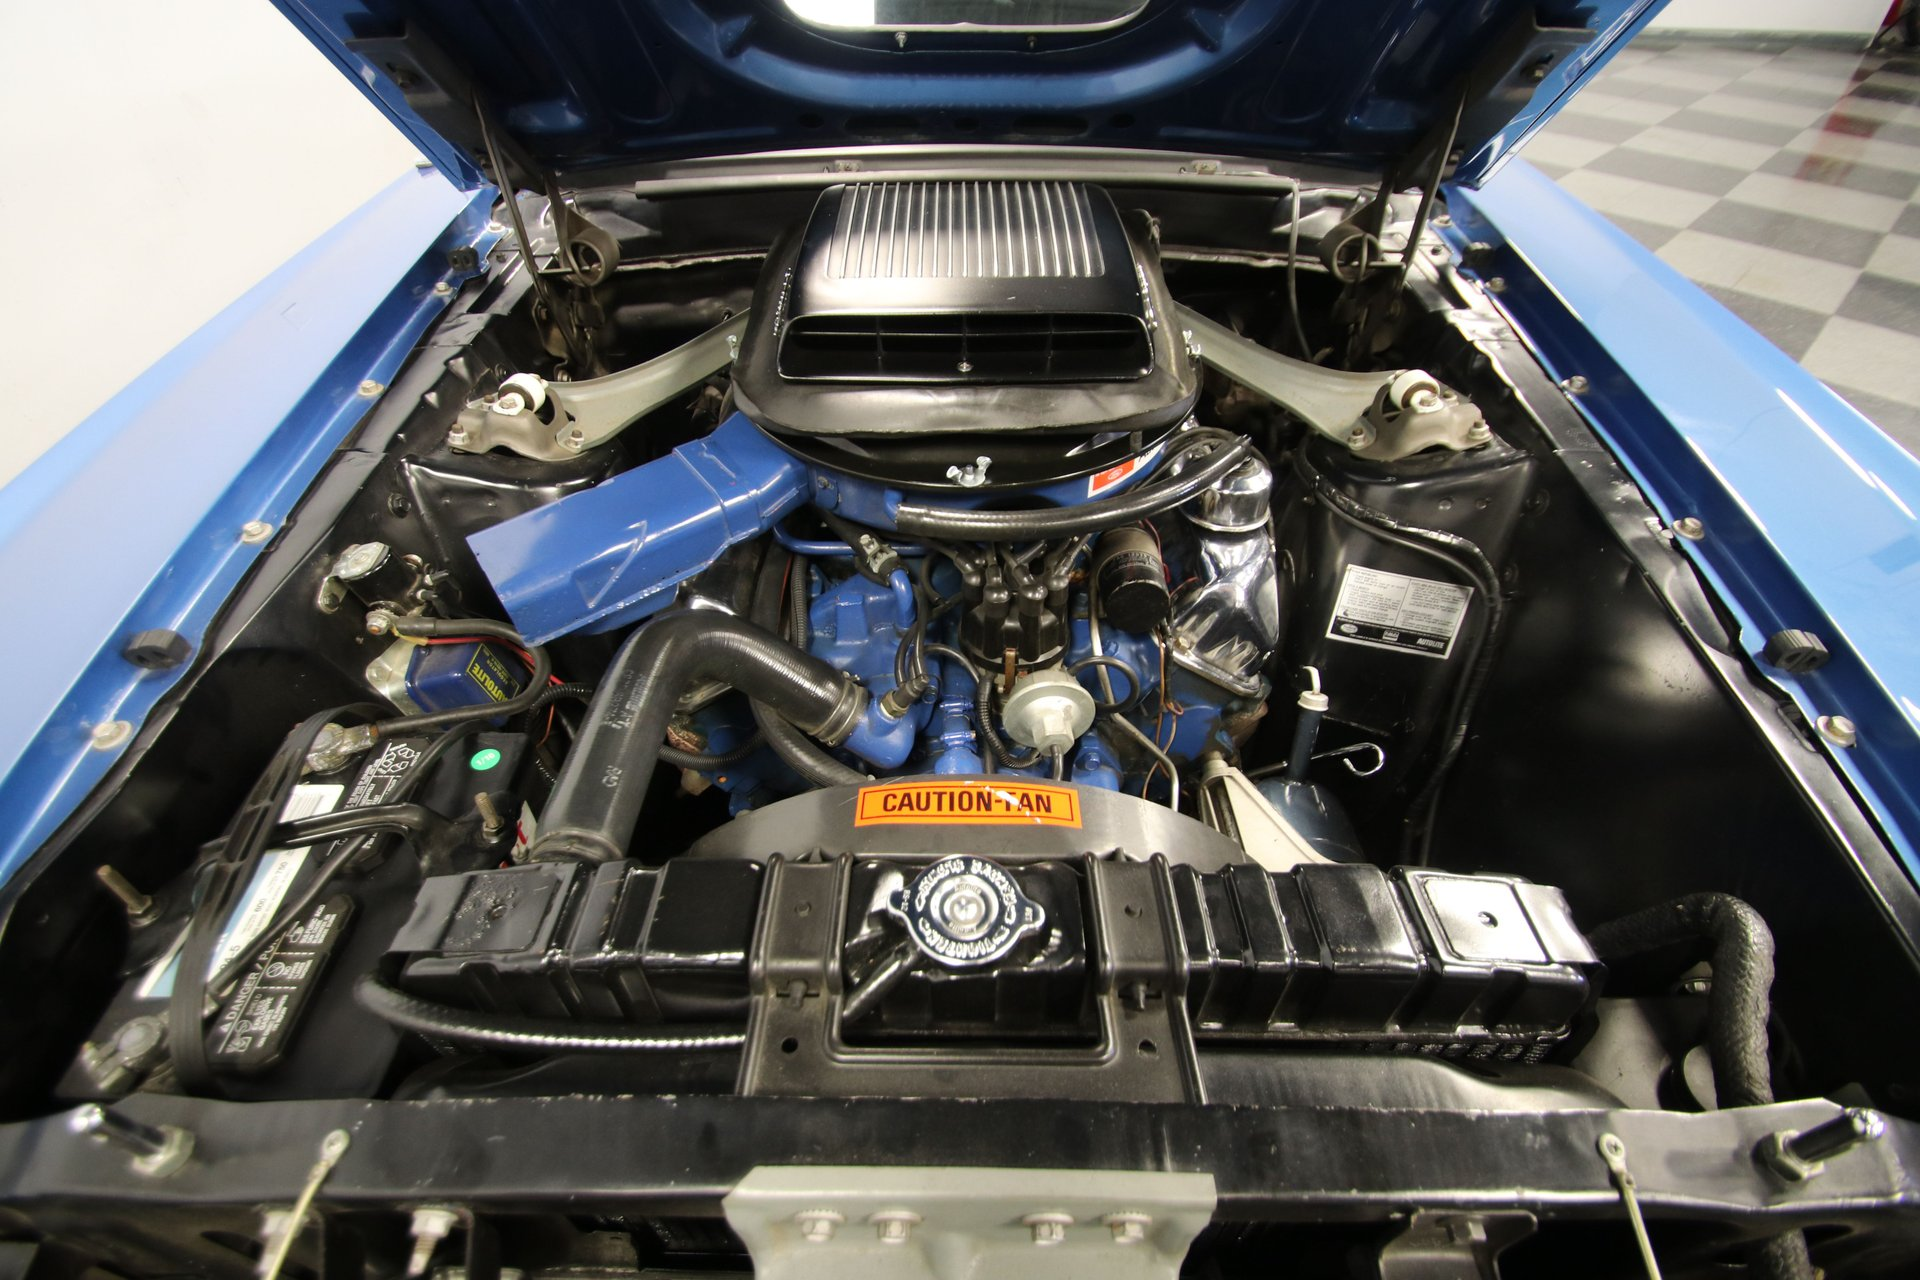 1969 ford mustang mach 1 428 super cobra jet